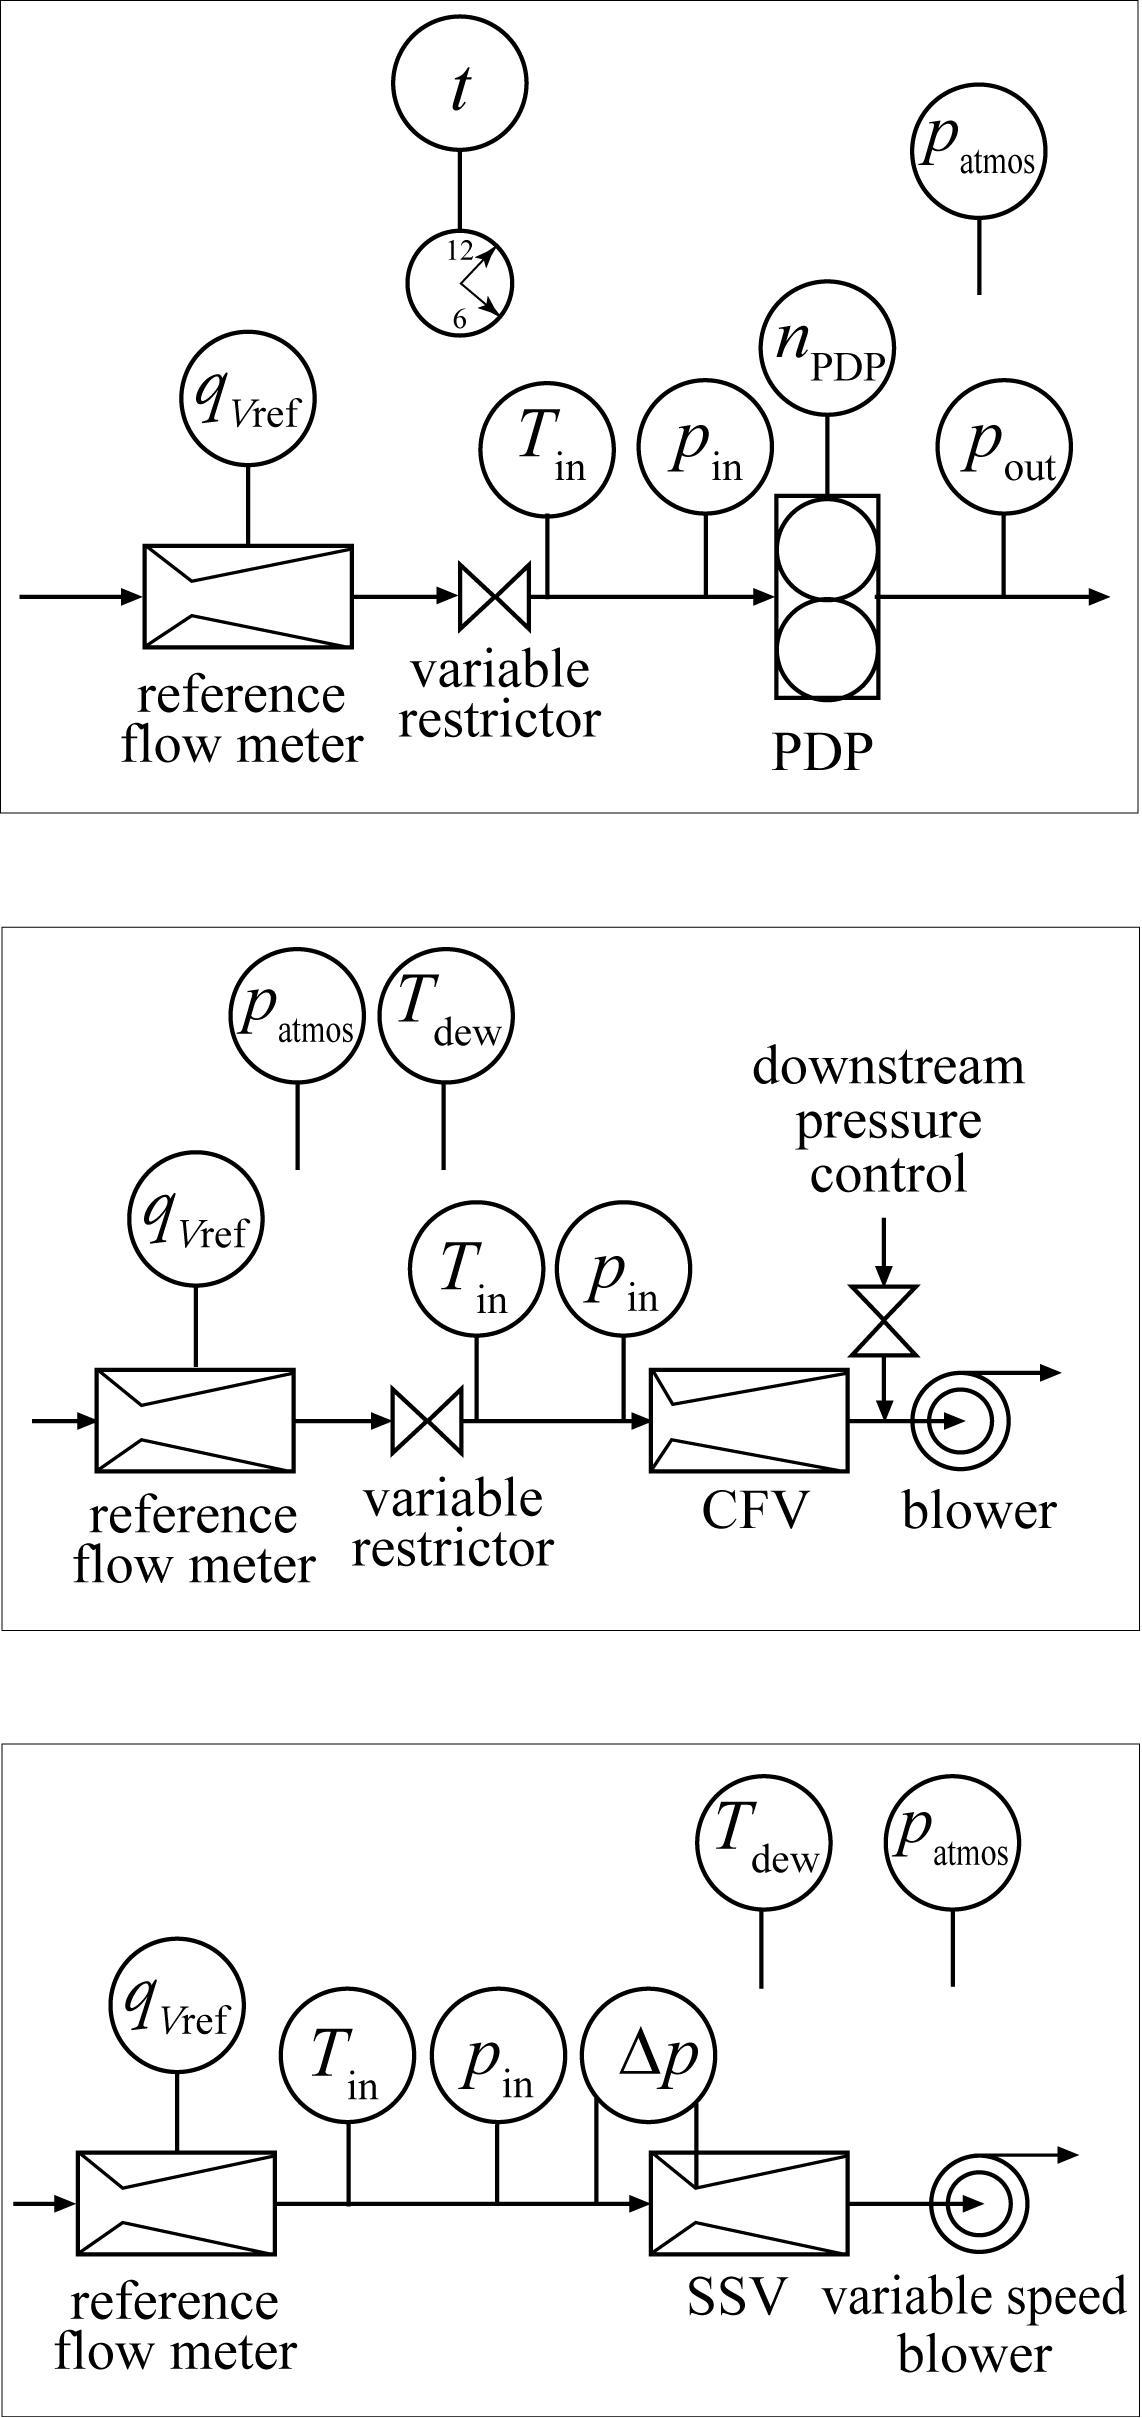 Eur Lex Ares20166327594 El Liquid Ring Vacuum Pump Diagram Closed Loop Butane Extraction System Schematic Diagrams For Diluted Exhaust Flow Cvs Calibration